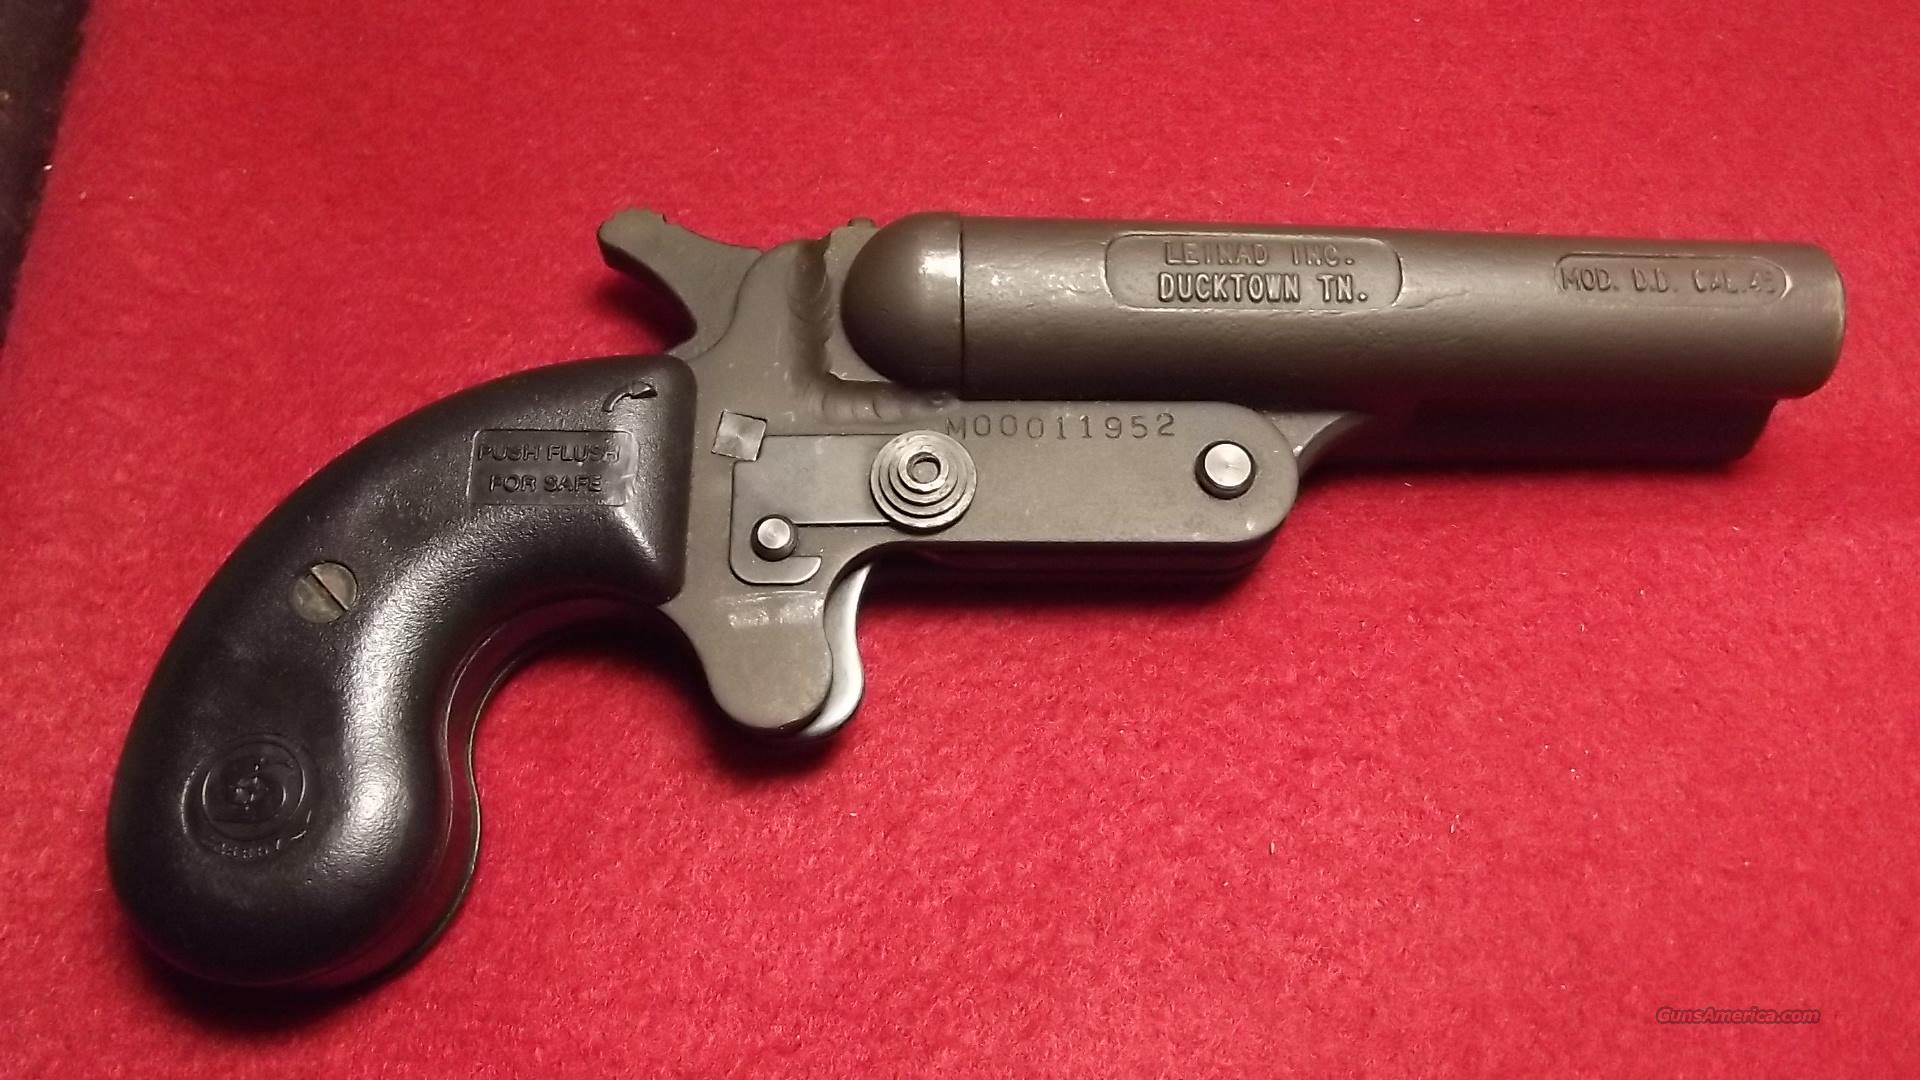 Cobray / Leinad DD Double Barrel Derringer 45/410